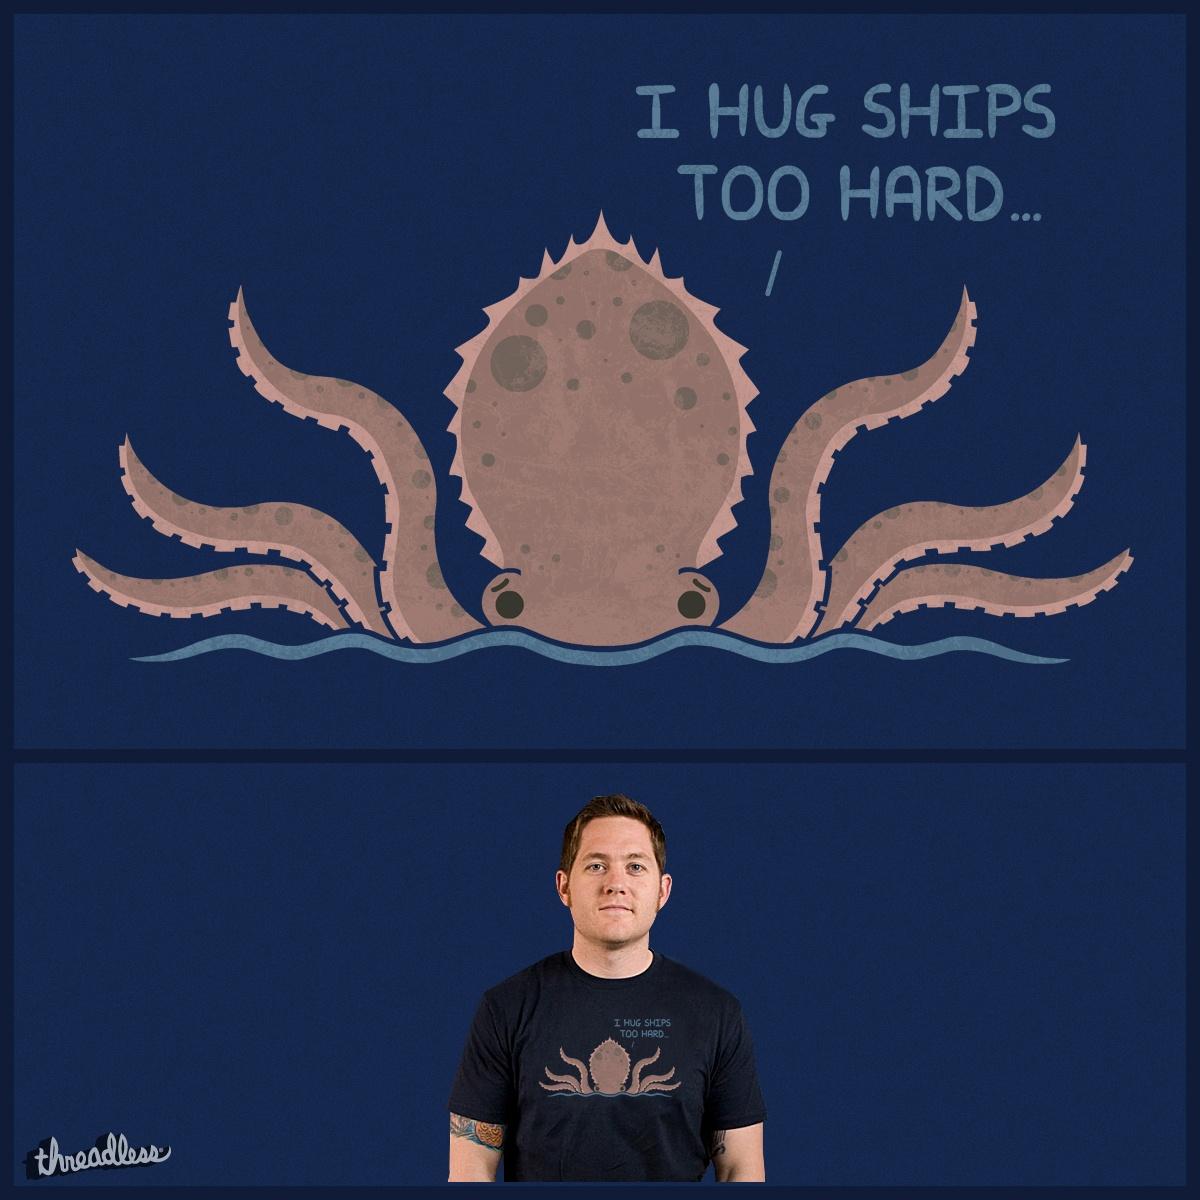 Kraken Problems by TeoZ on Threadless